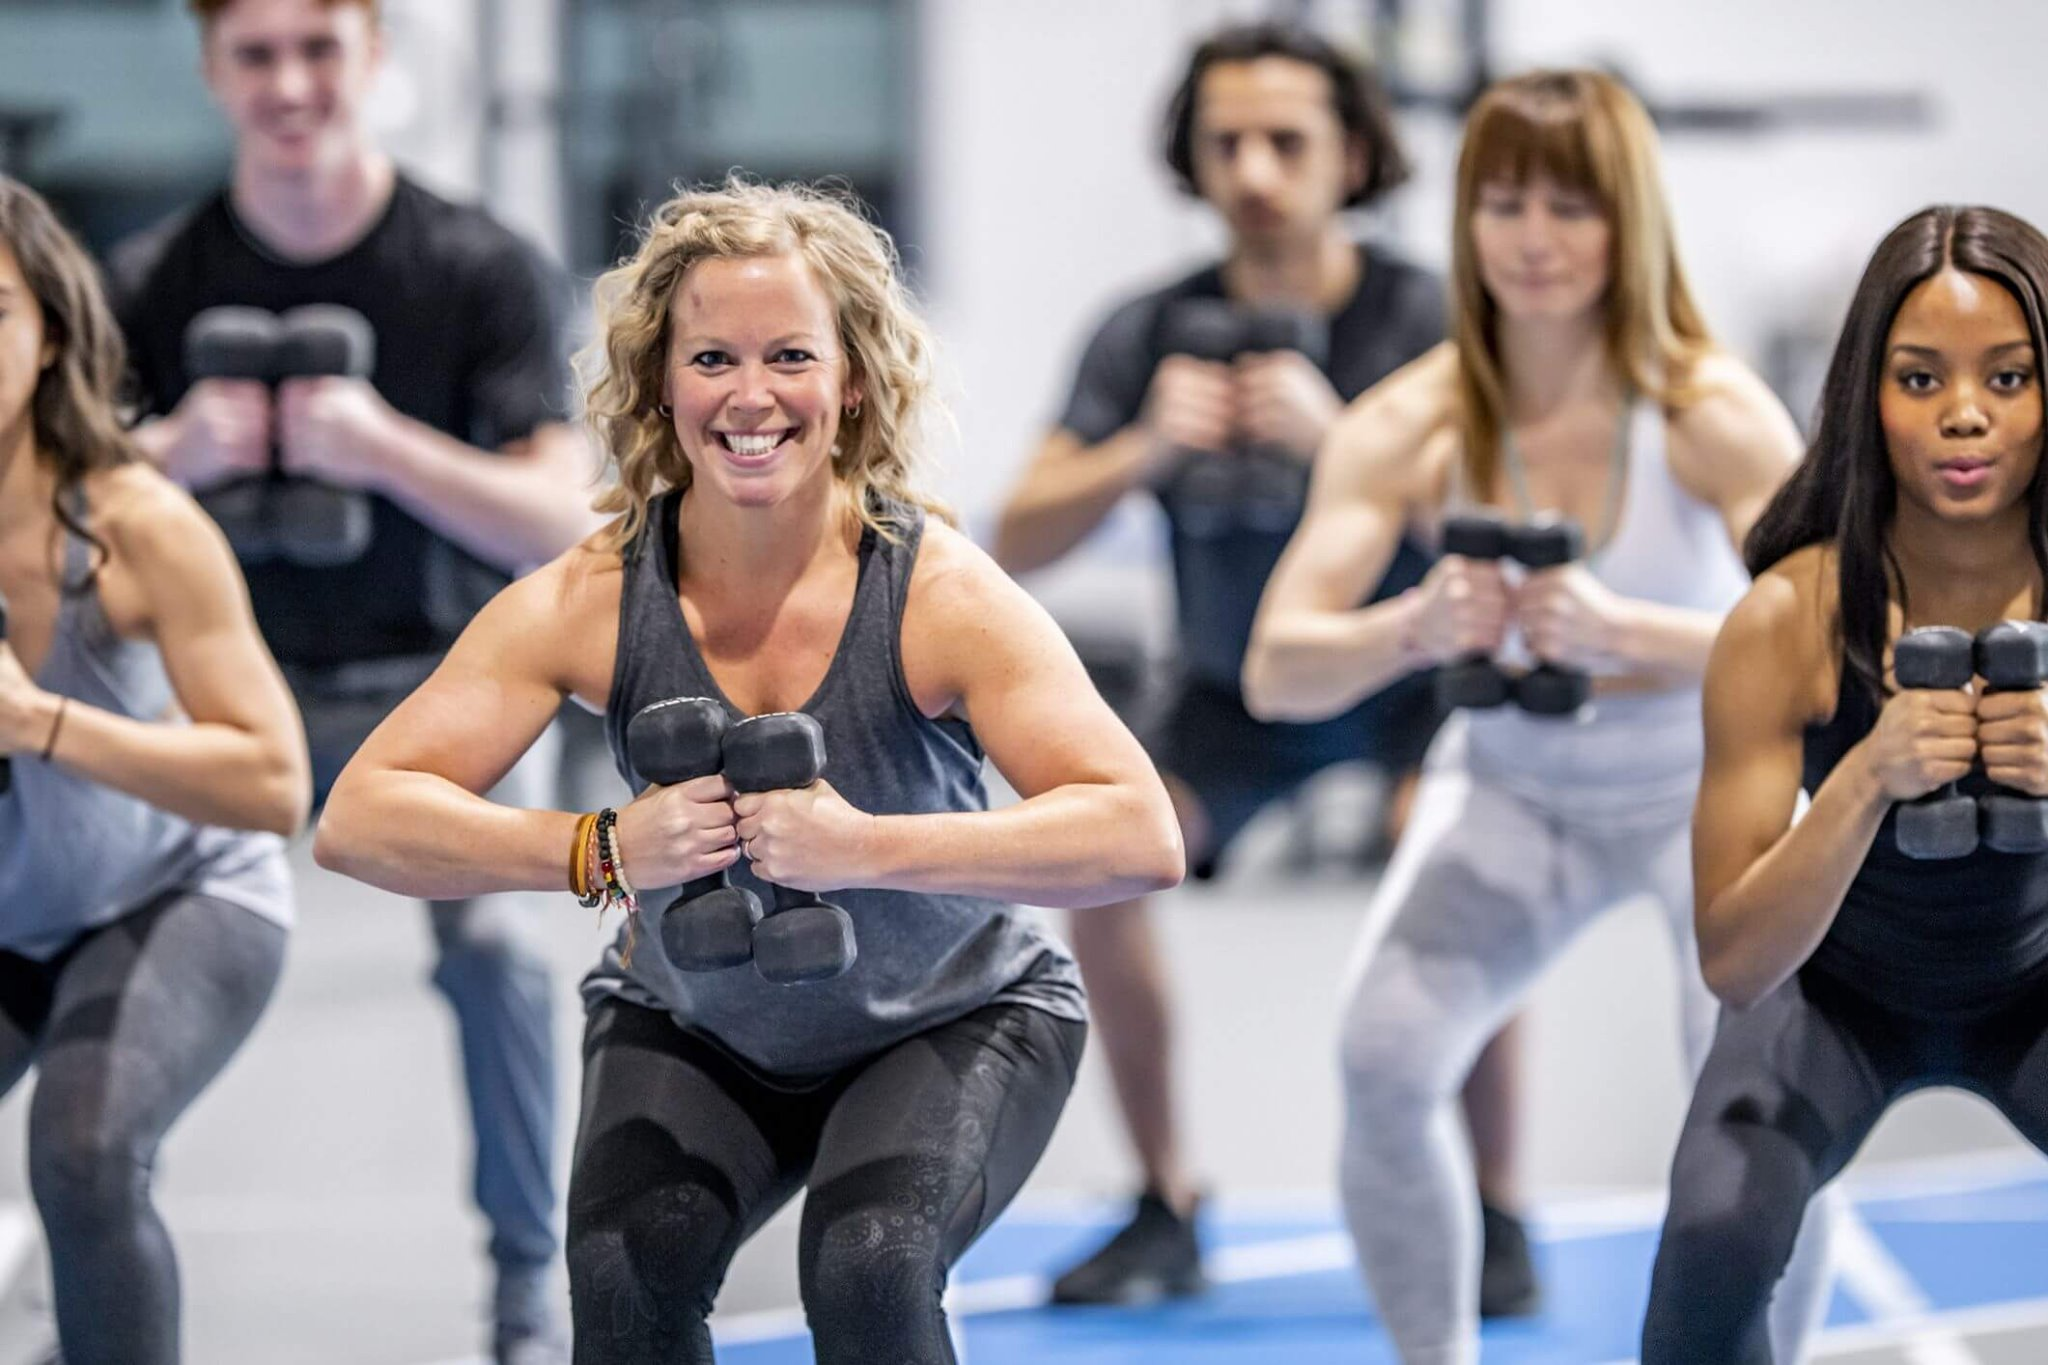 YMCA 360 – Online Exercise YMCA Blog Post